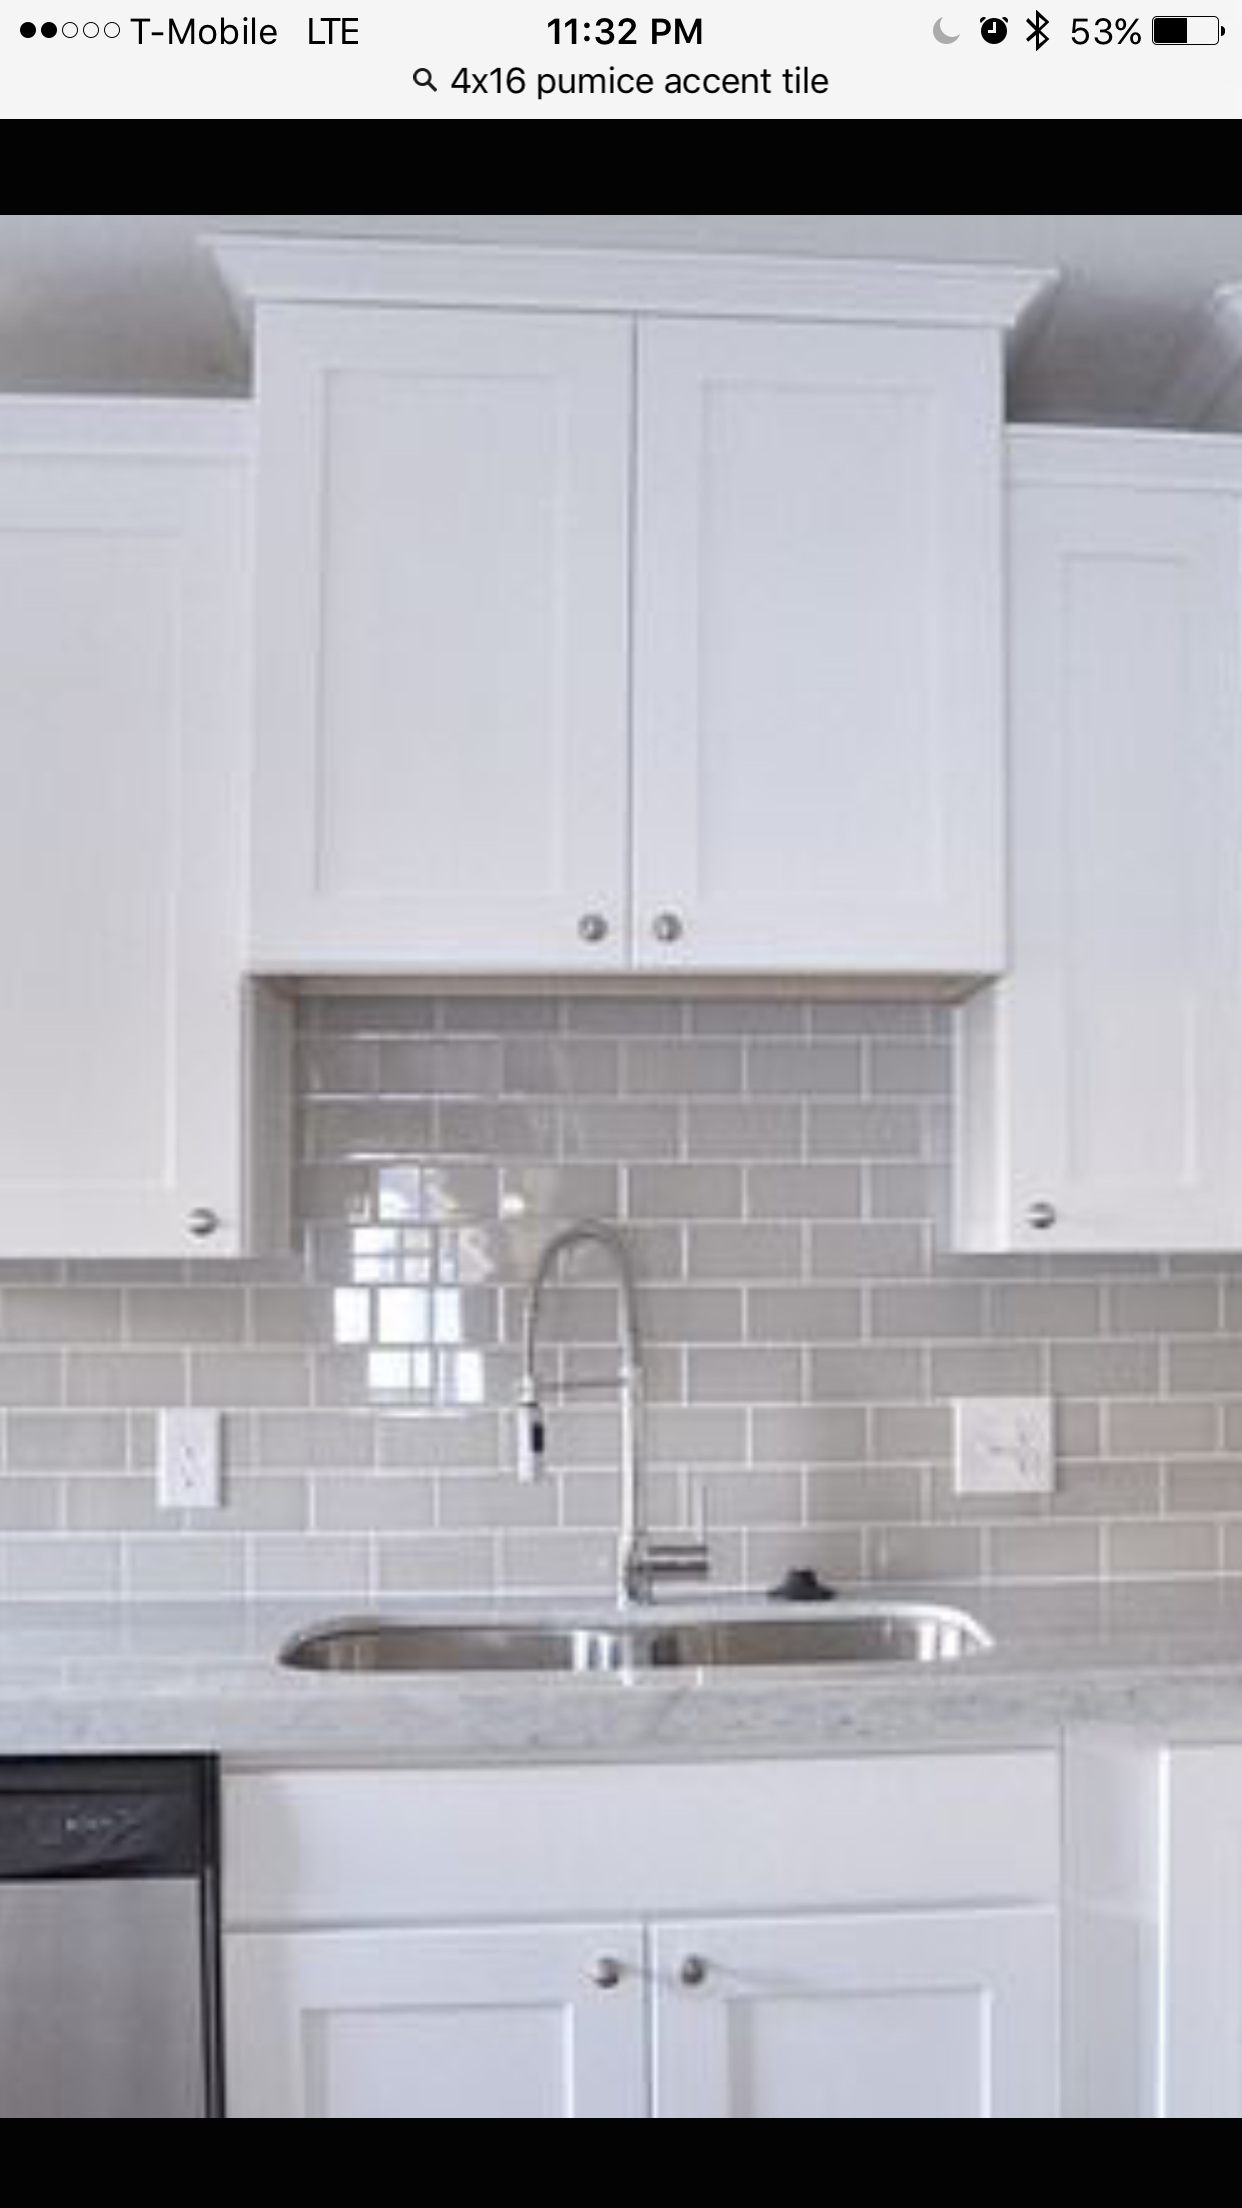 Pumice tile backsplash new home kitchen pinterest pumice pumice tile backsplash dailygadgetfo Choice Image